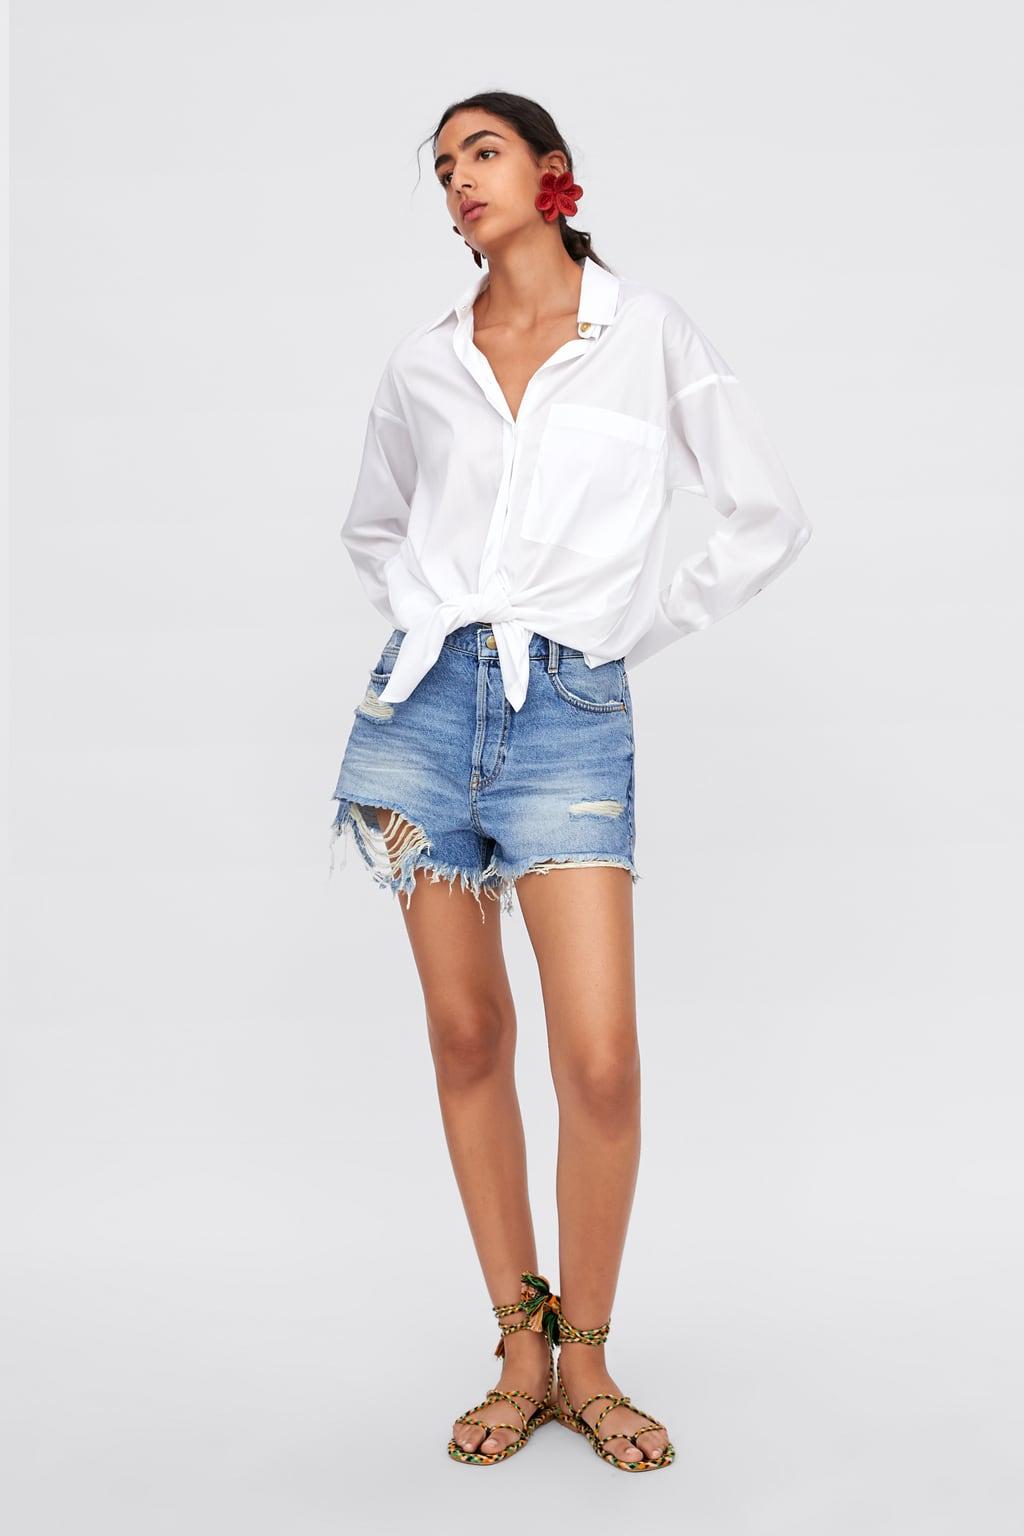 edaa53a4 Popular Fashion Items At Zara, Best Sellers Summer 2019